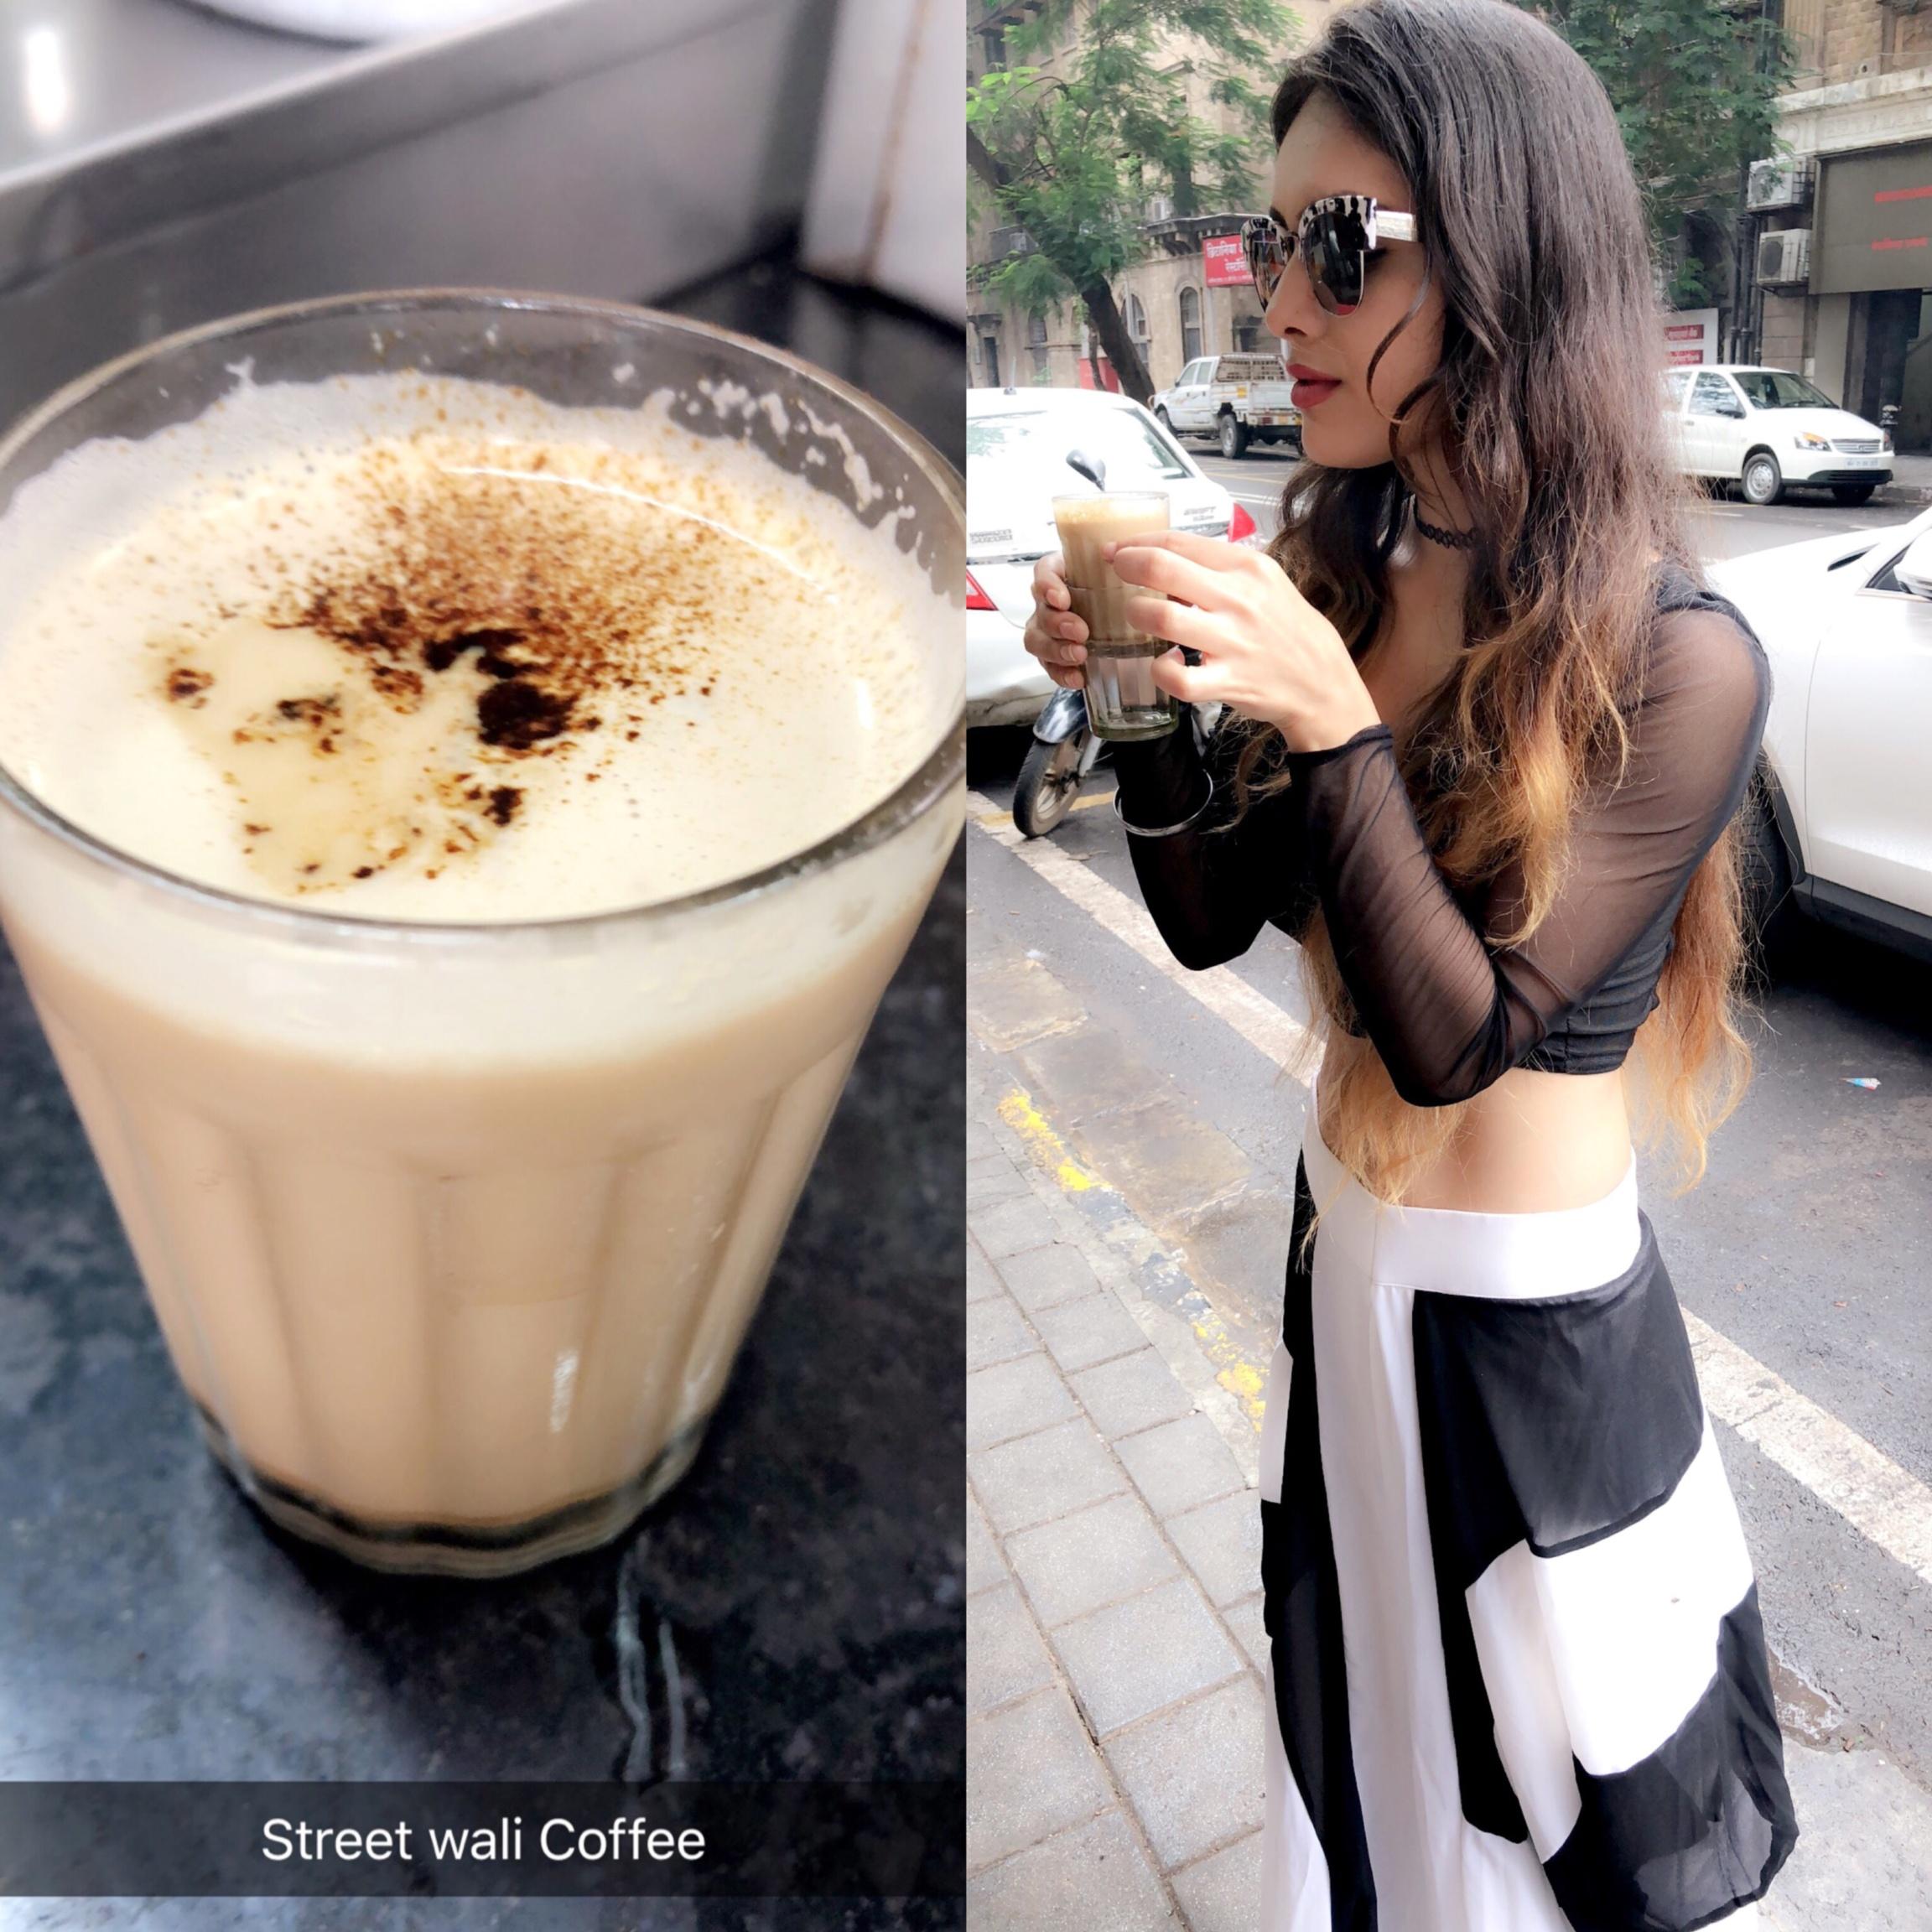 Sunday Happy Shoot day ... 😍😍😍 Enjoying #streetcoffee in #town ☕️ : #sundayvibes #happysunday #shoot #shooting #shootingday #happyday #happymode #vibes #coffee #streetstyle #mumbaistreets #mumbai #bombay #beauty #love #candid #candidshots #fashioninsta #nehamalik #model #actor #blogger